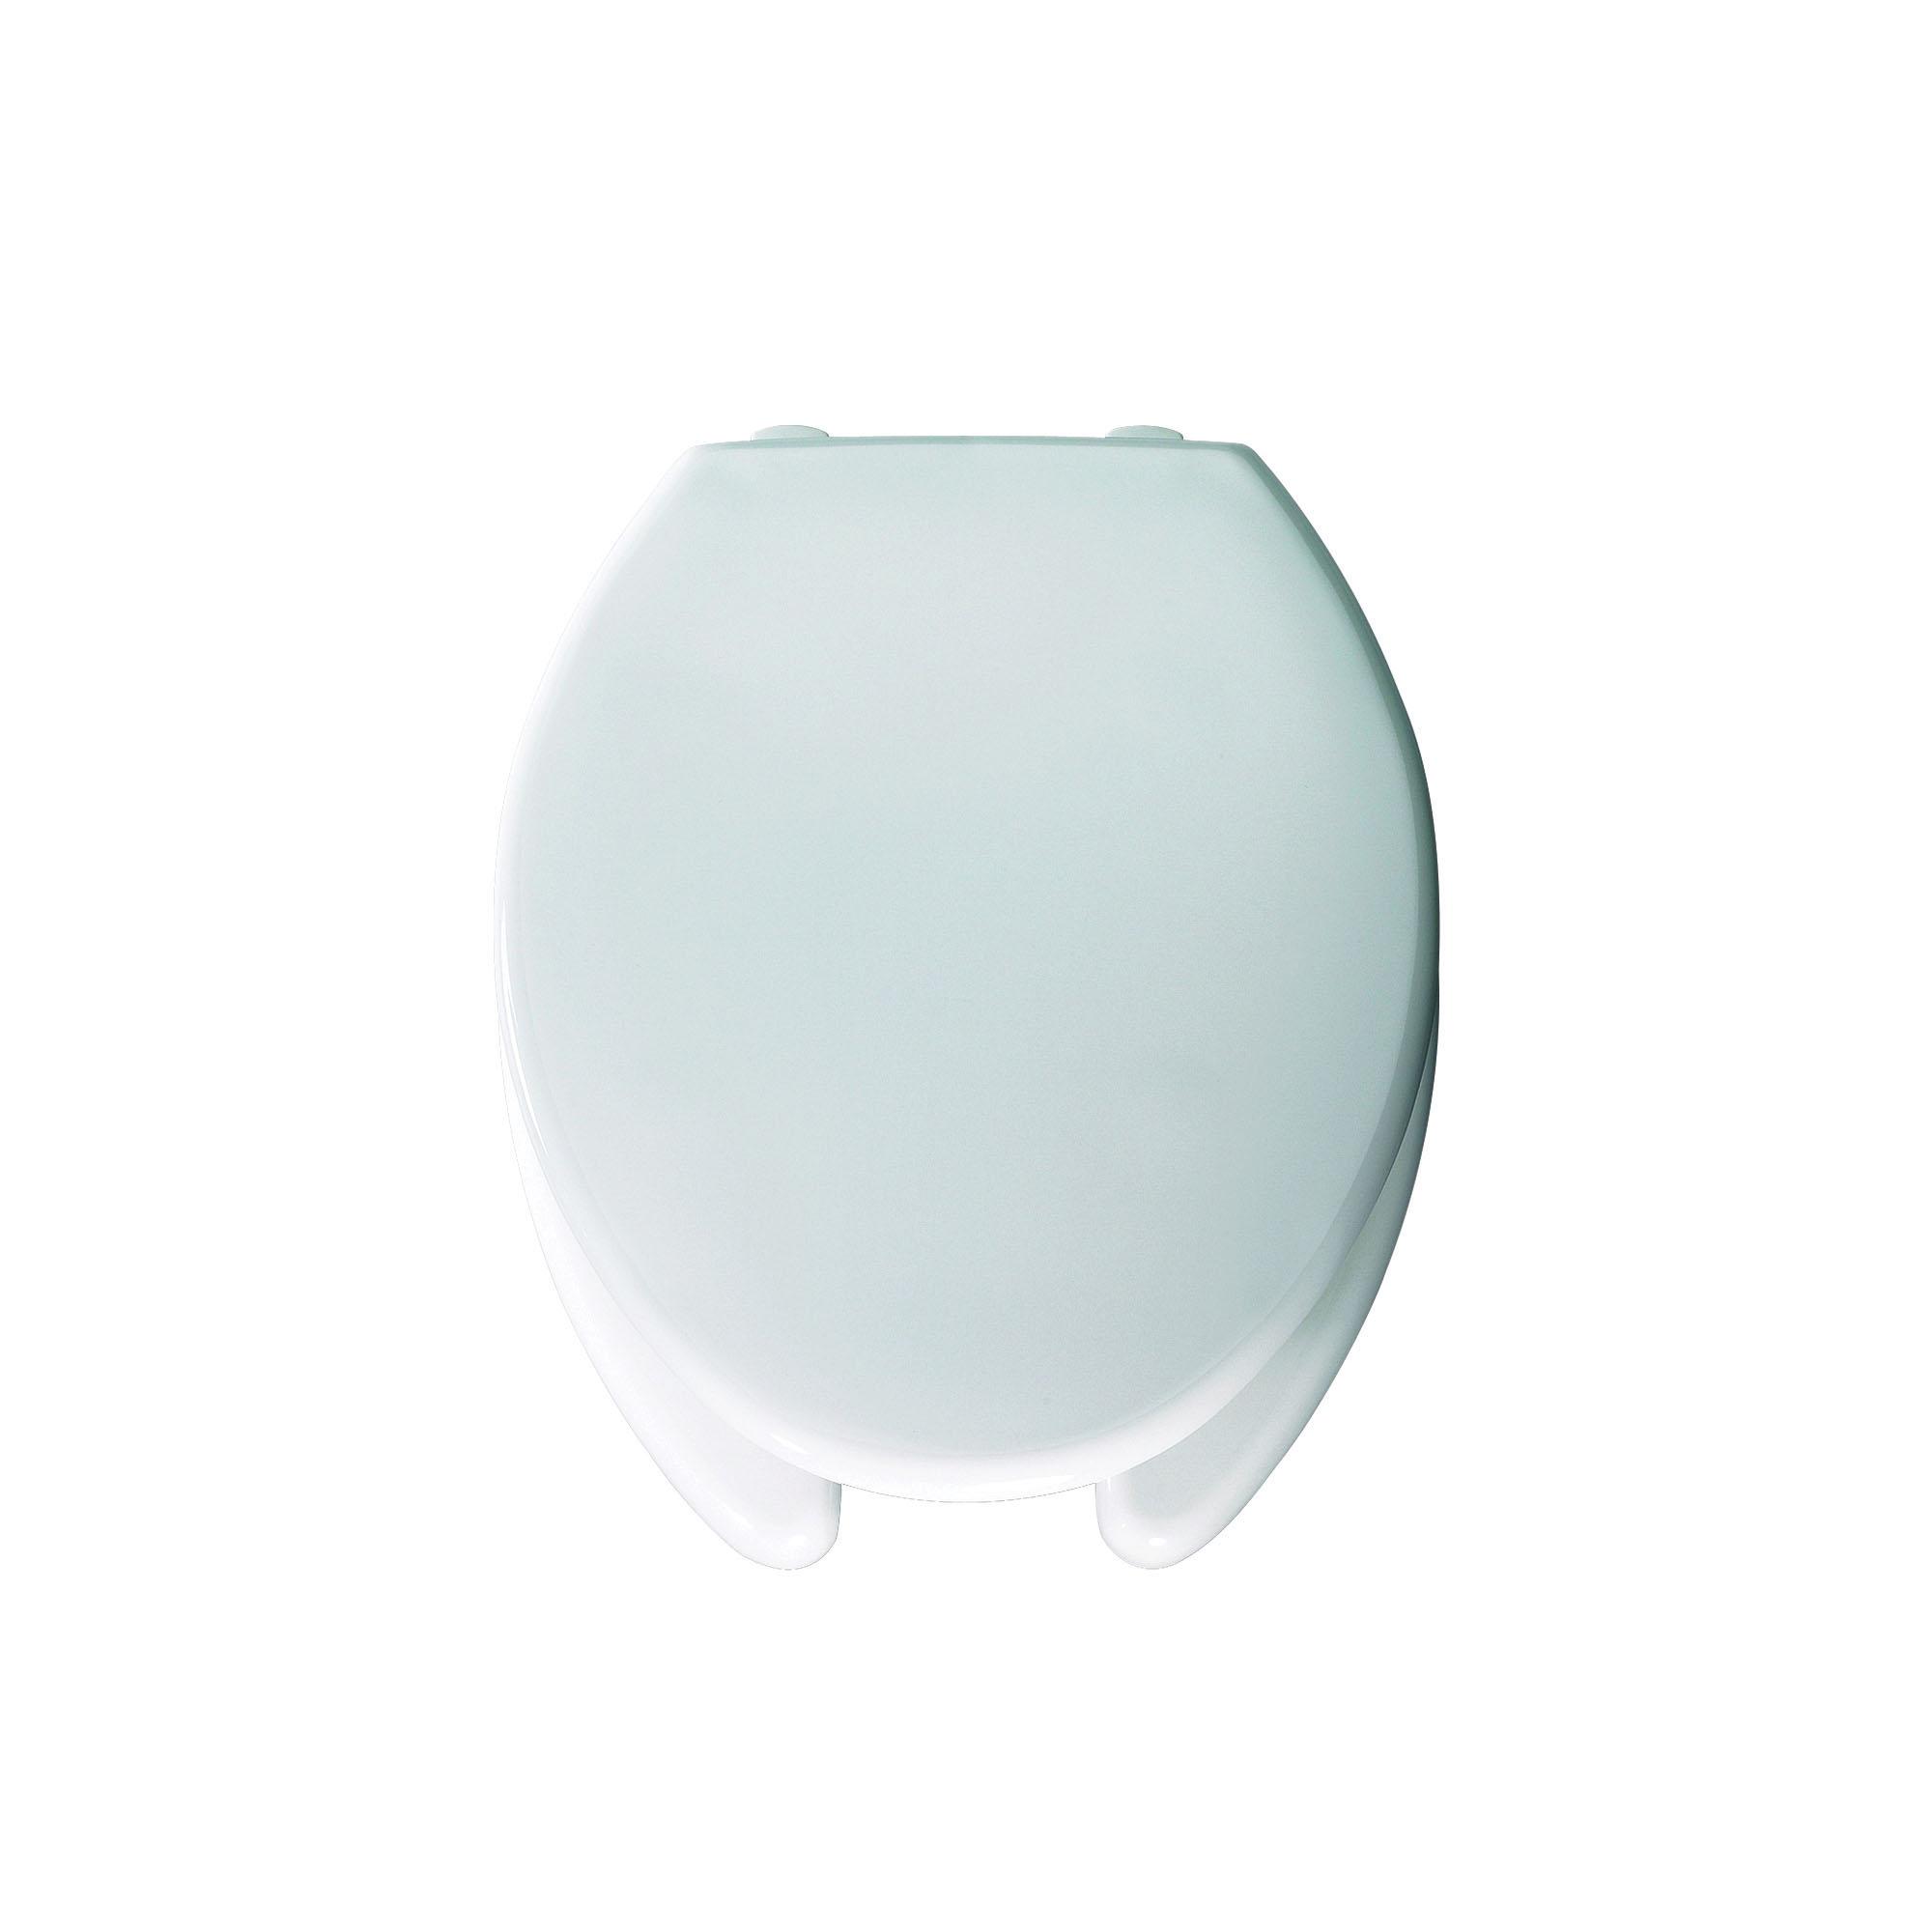 Superb Consolidated Supply Co Elongated Toilet Seats Creativecarmelina Interior Chair Design Creativecarmelinacom